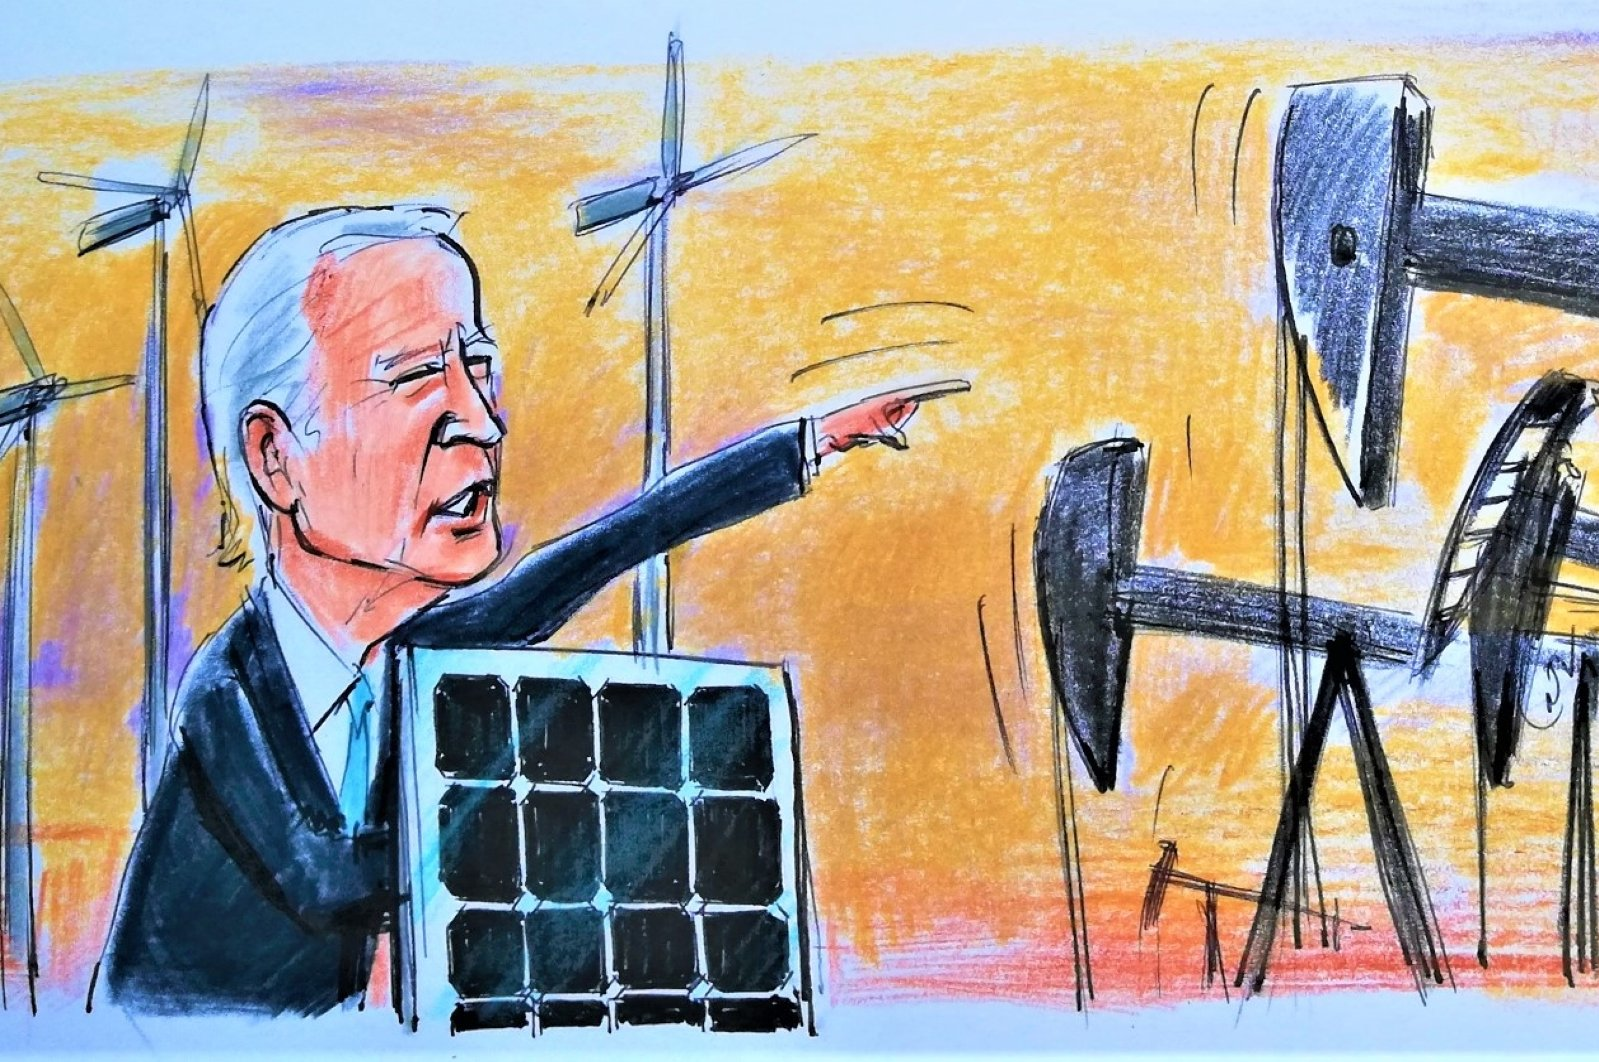 An illustration by Erhan Yalvaç shows U.S. President Joe Biden speaking on the U.S.' new energy policy road map.